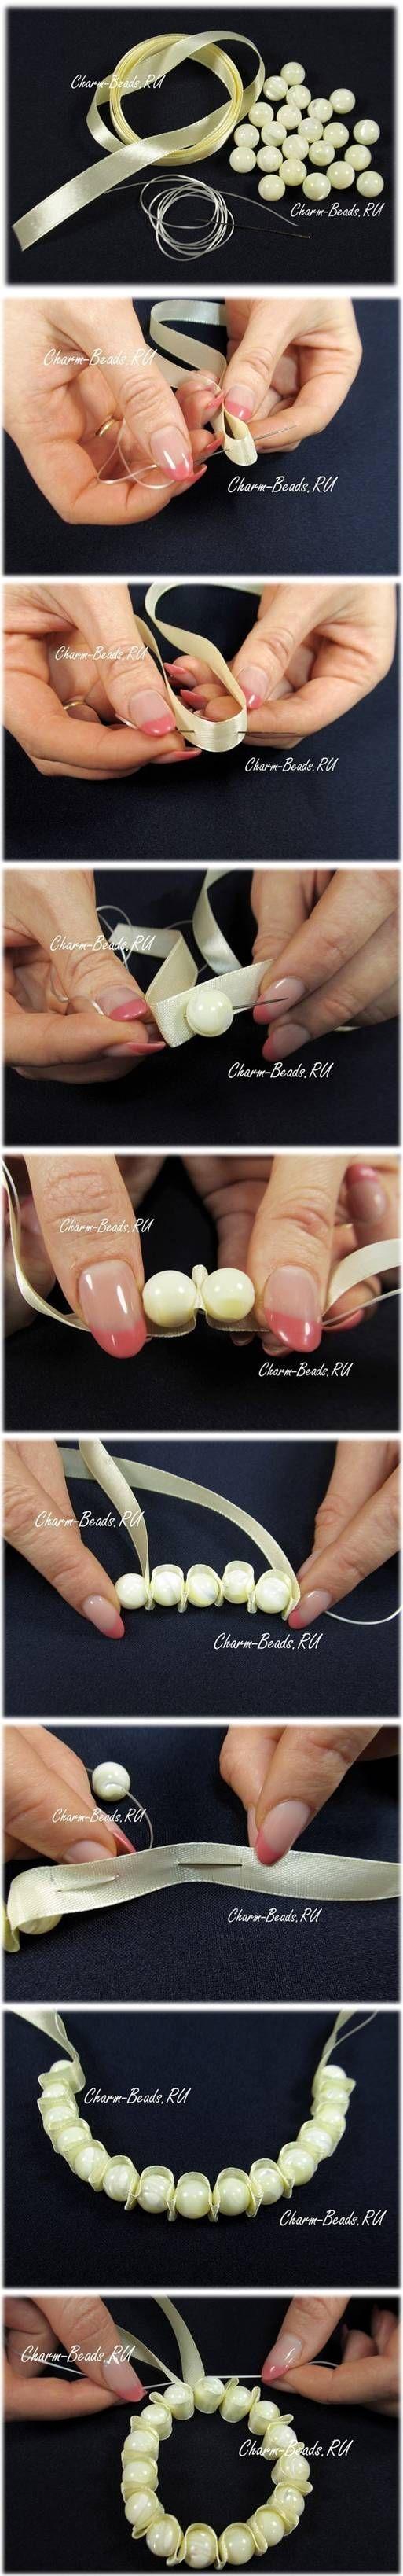 DIY Beads Satin Ribbon Bracelet